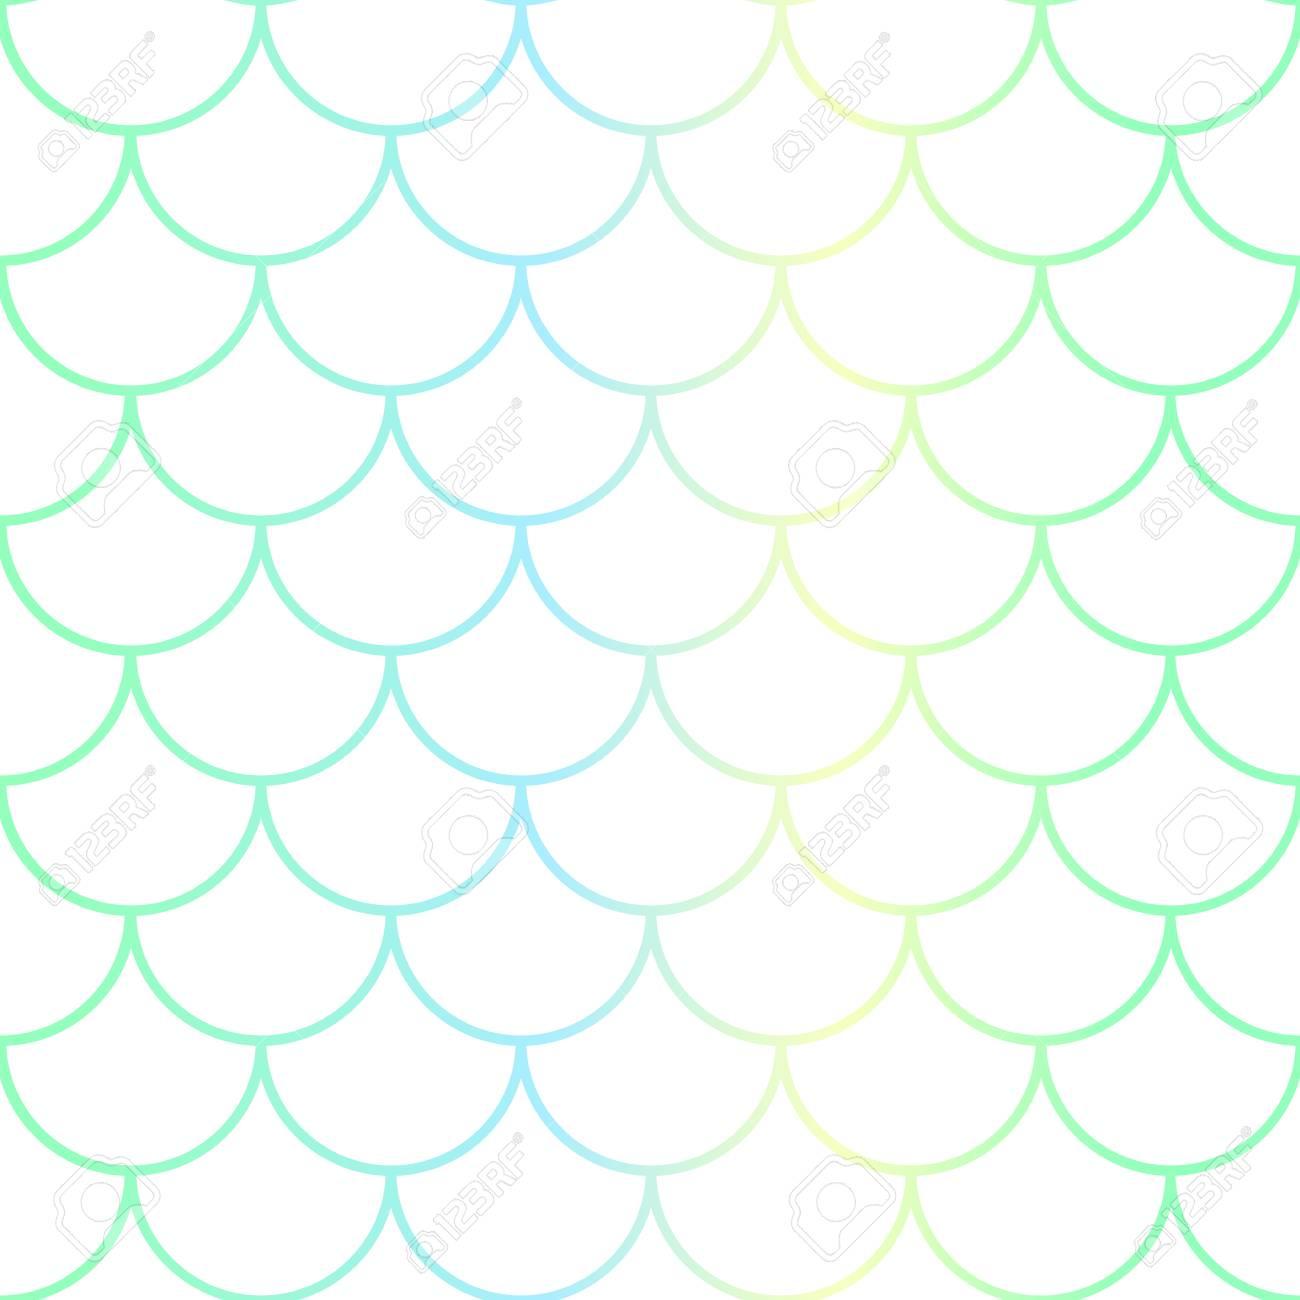 aqua blue fish scale seamless pattern colorful gradient net